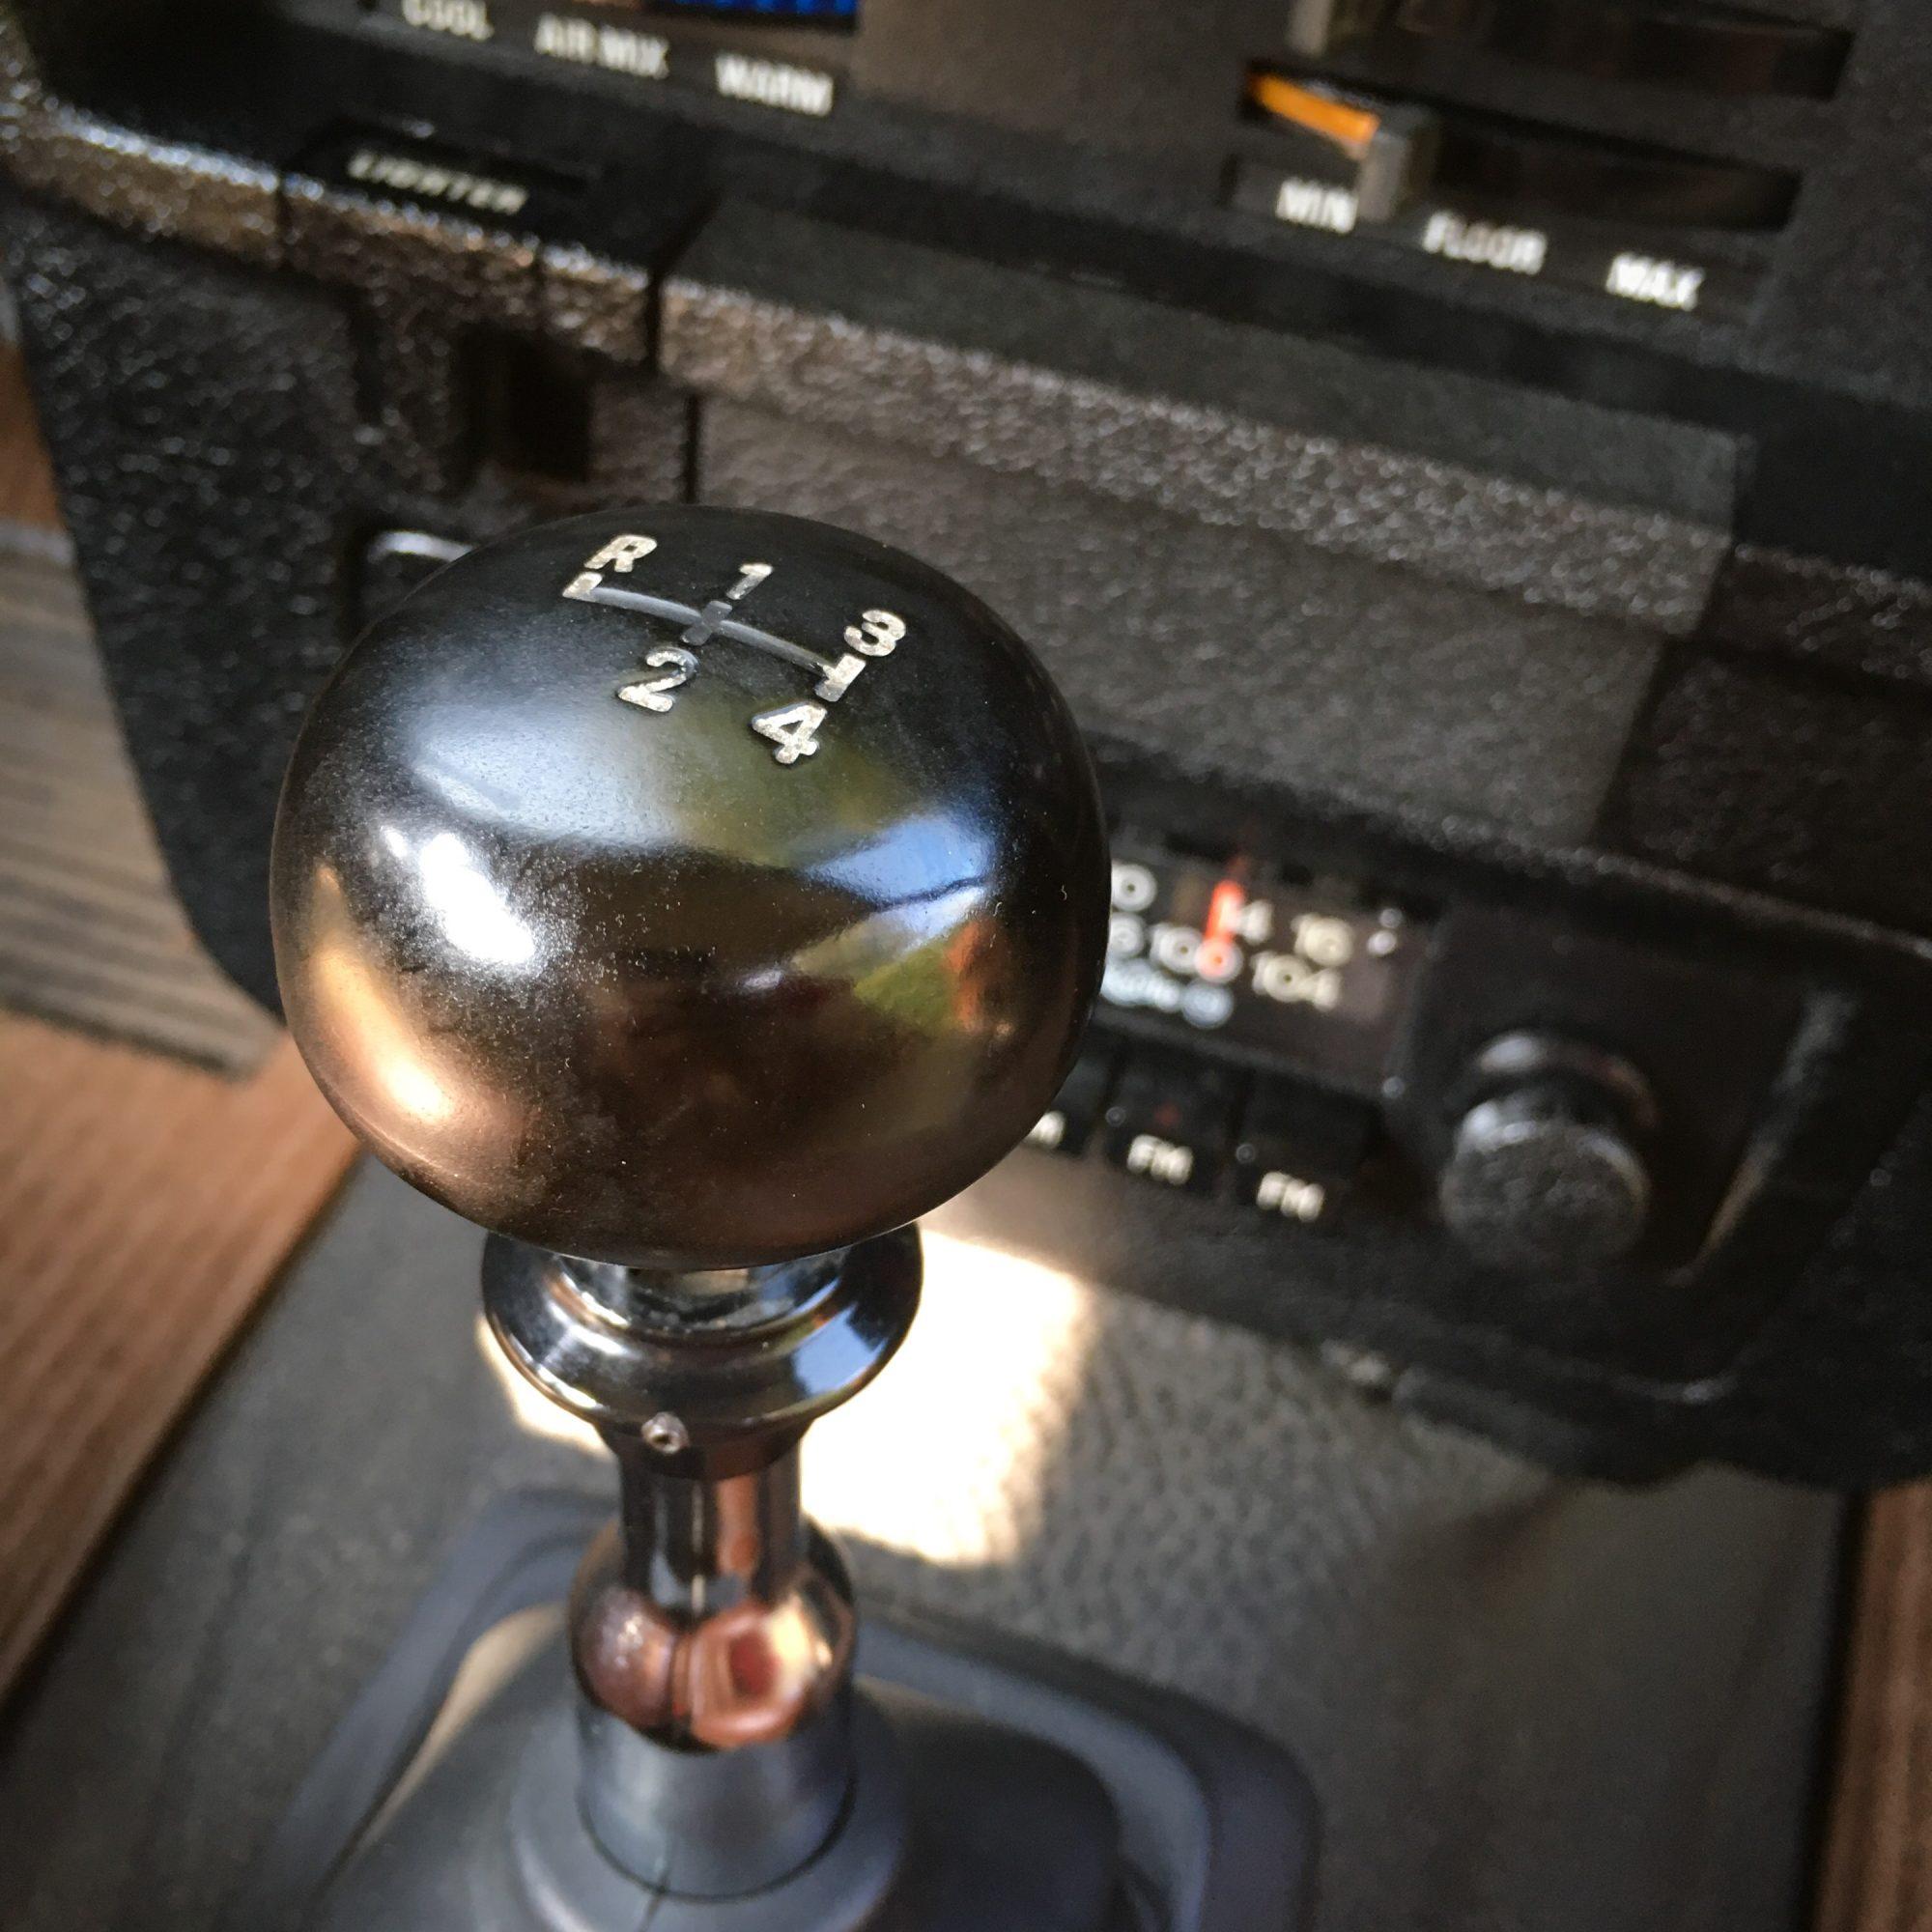 Yannick-Moonen-1976-Volvo-245L-Road-Trip-15-2000x2000